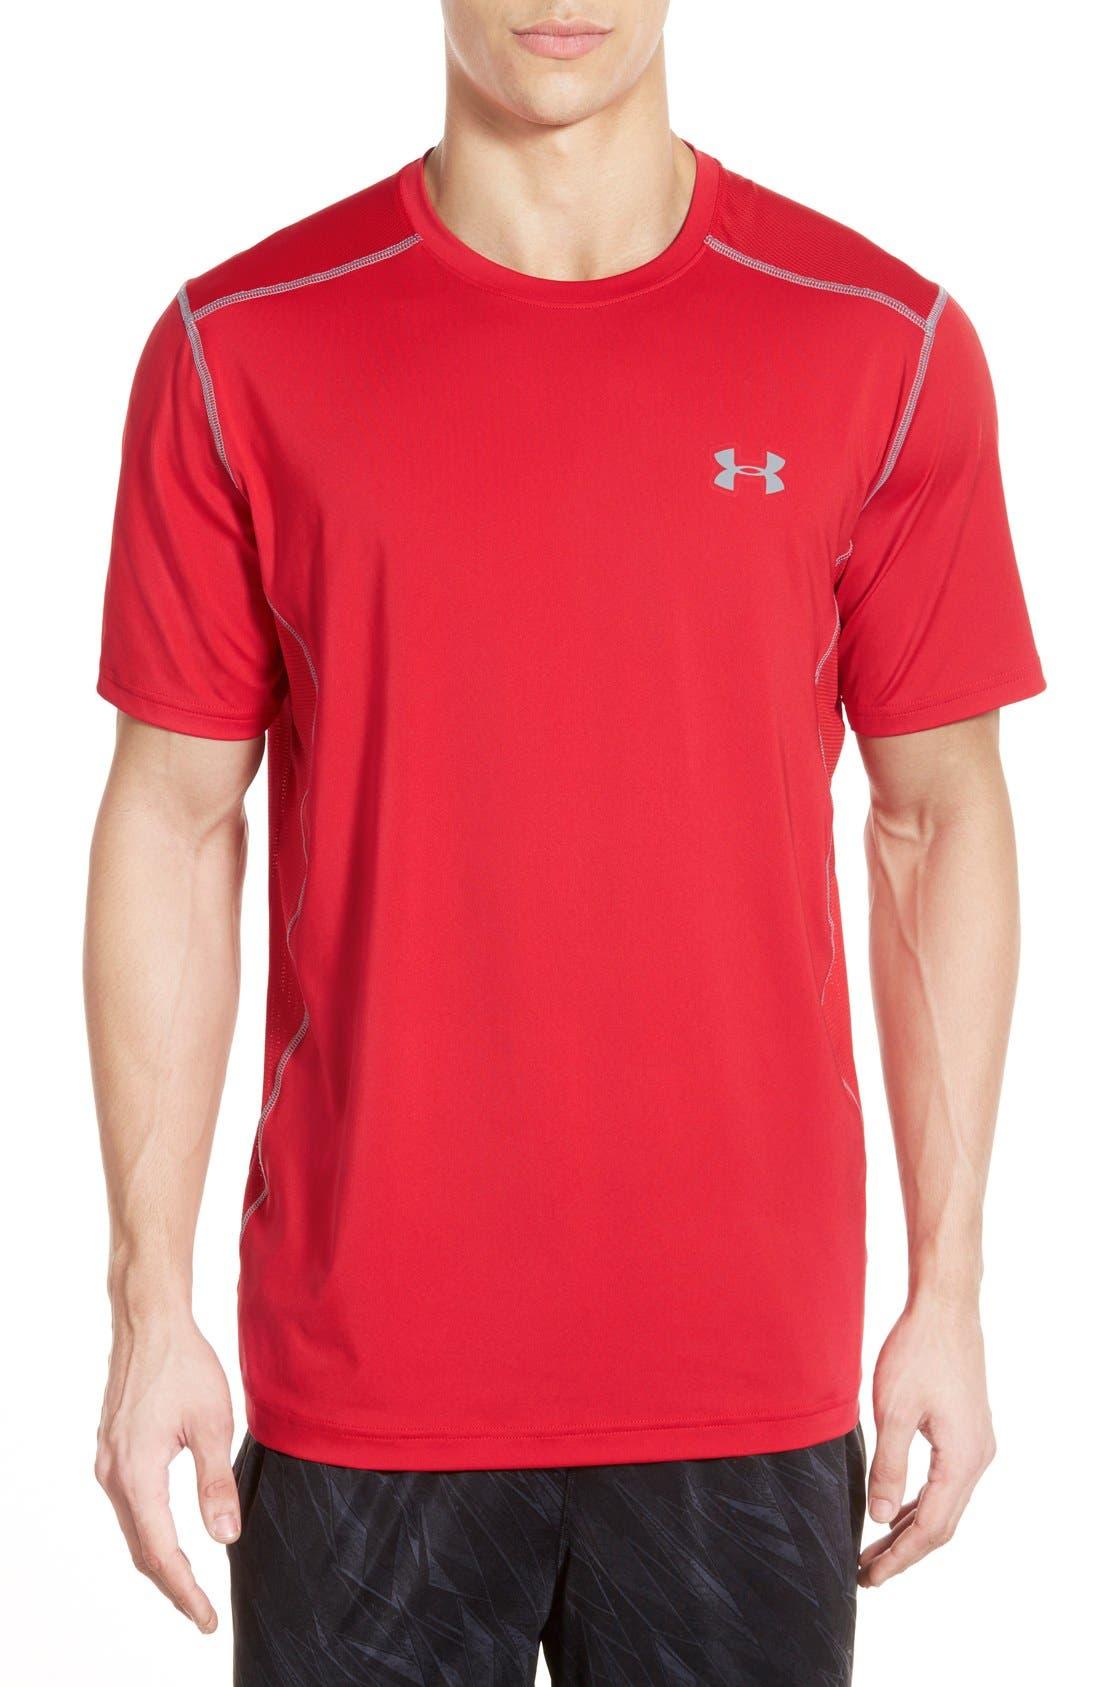 Under Armour 'Raid' HeatGear® Training T-Shirt